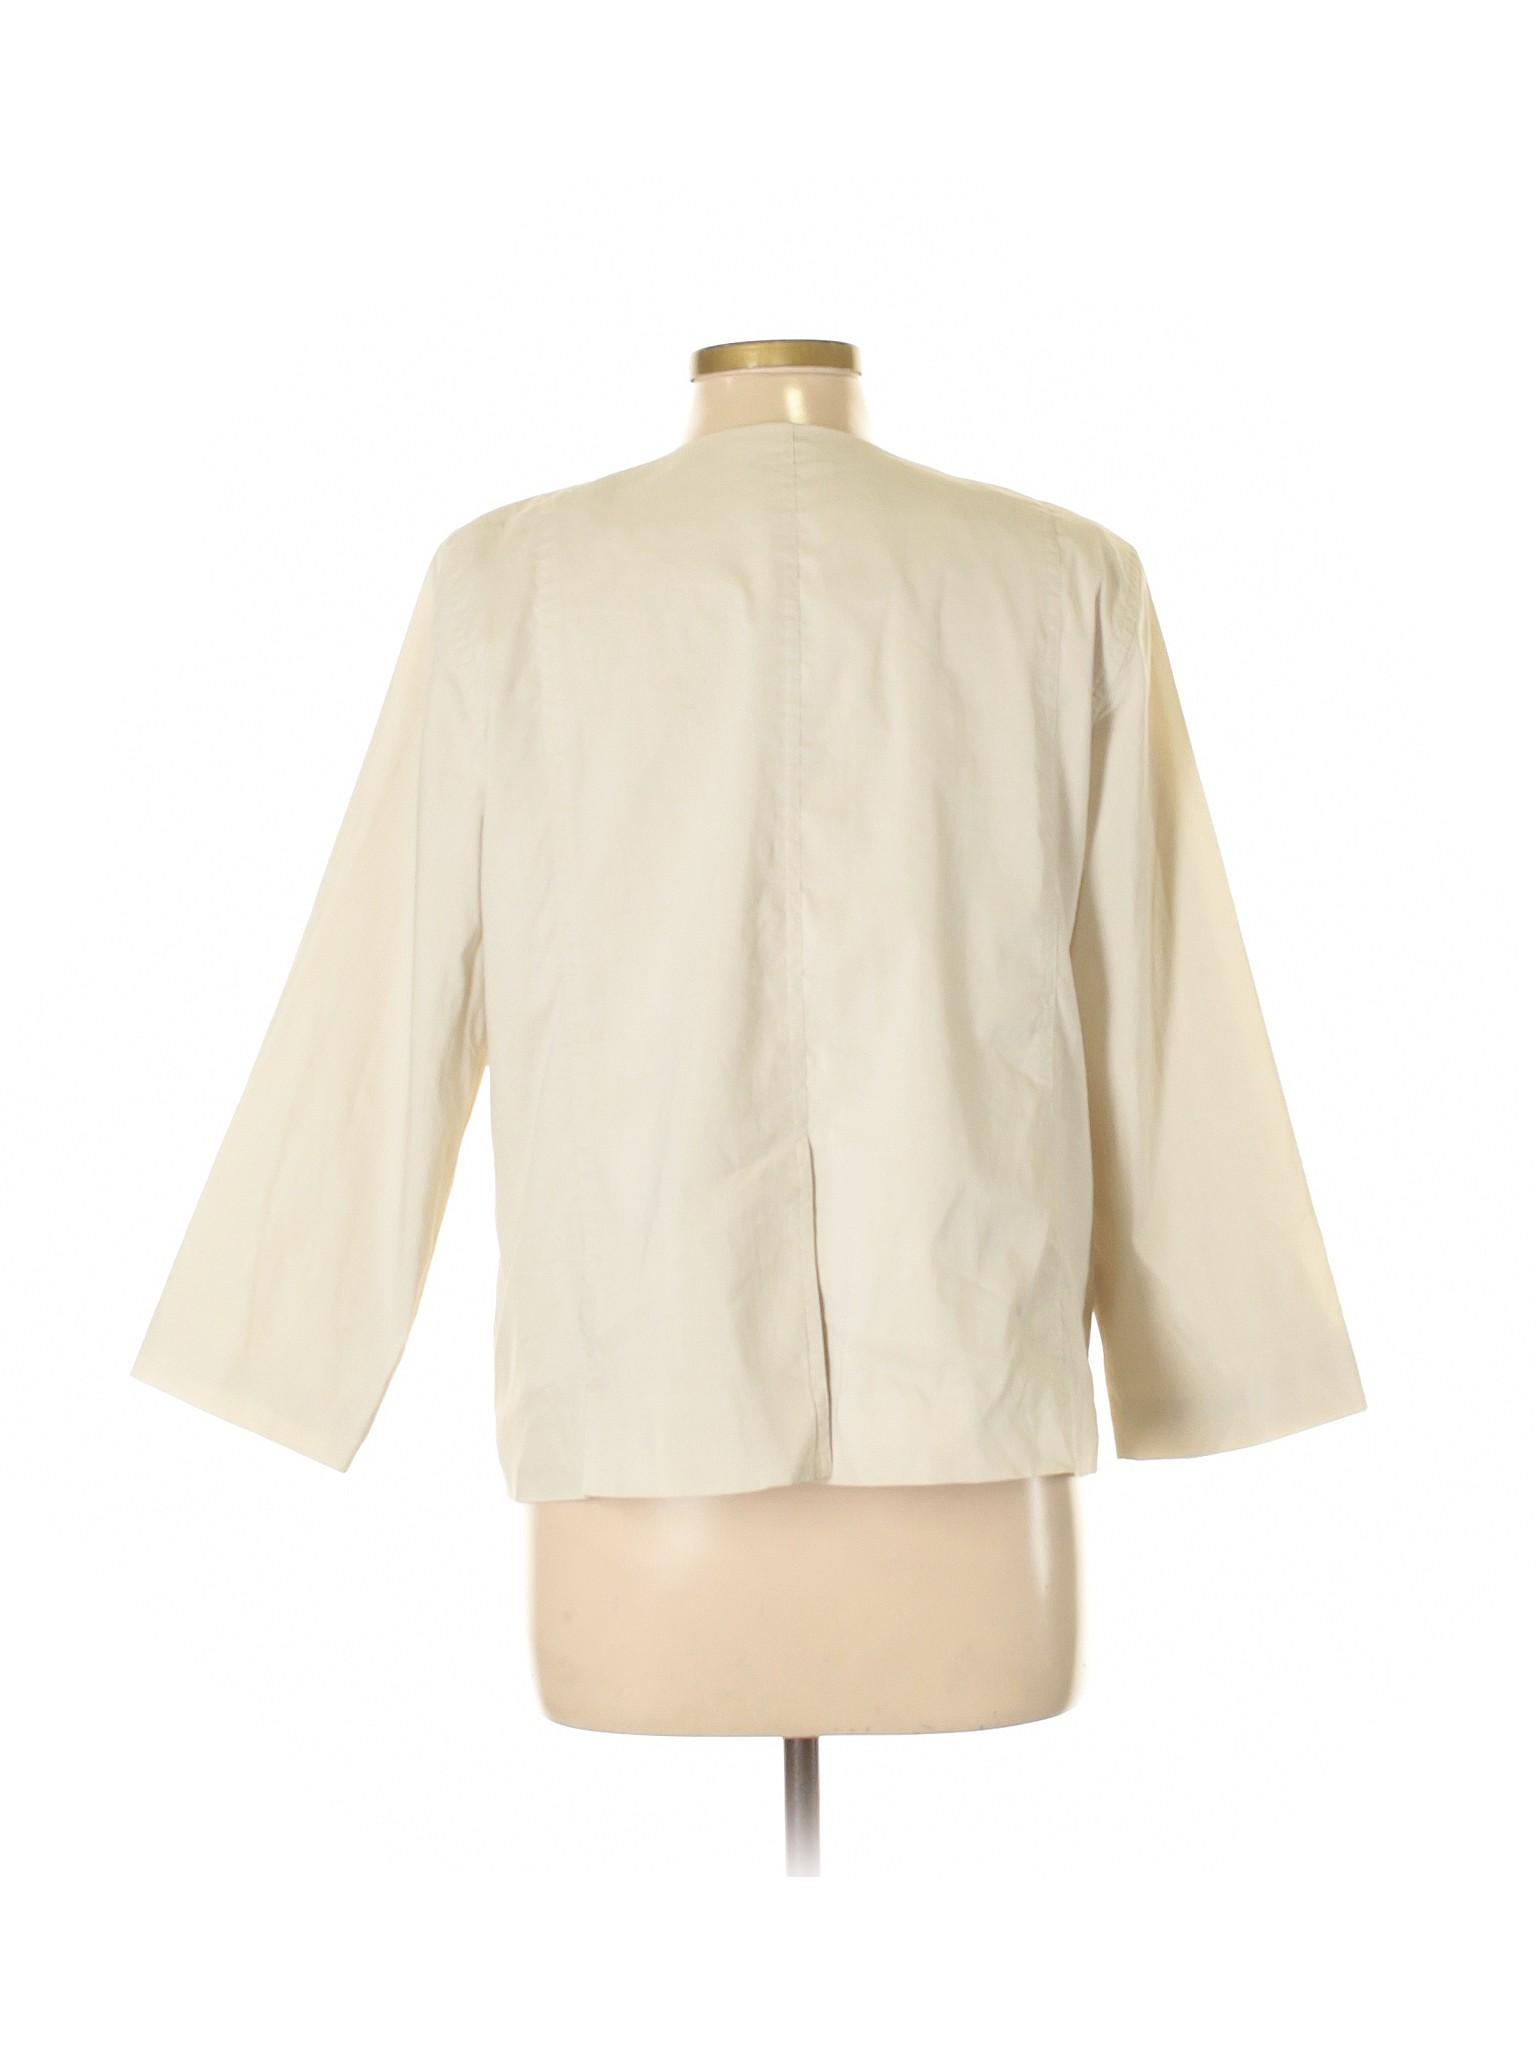 Boutique Jacket Jacket leisure leisure Eileen Boutique Boutique Fisher Boutique Jacket leisure leisure Eileen Eileen Fisher Eileen Fisher axYfW0